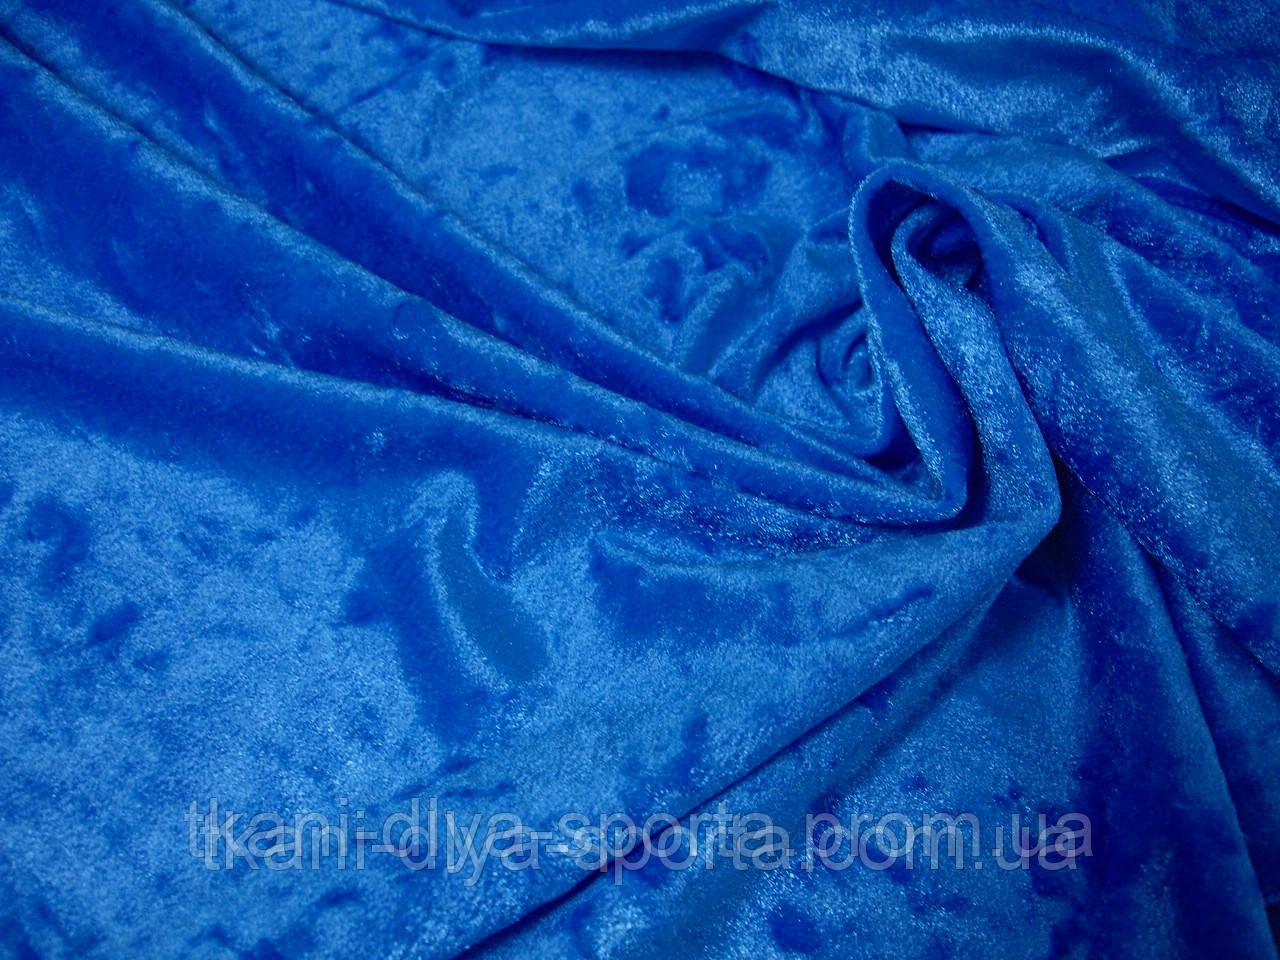 Cтрейч-бархат крэш ярко-синий